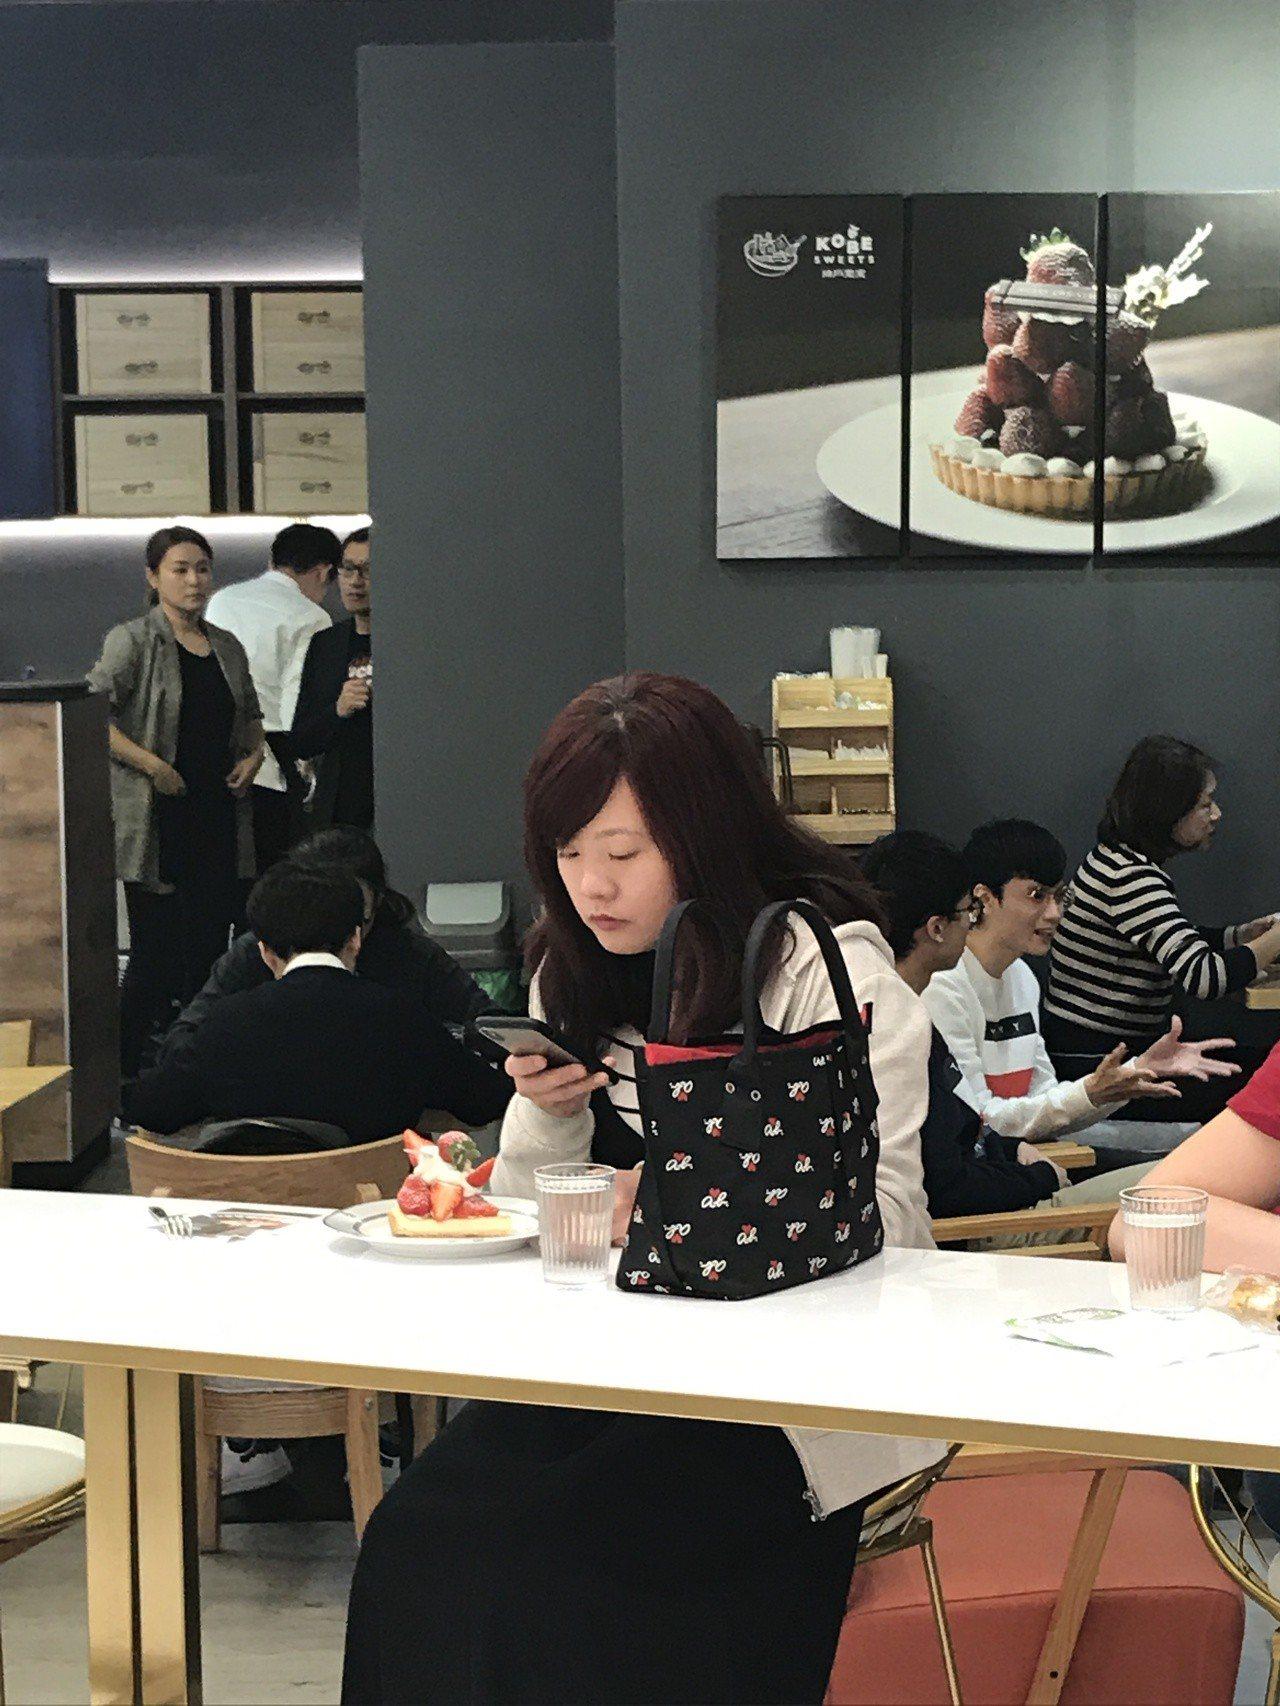 Kobe sweets cafe的水果蛋糕外表相當吸睛。記者江佩君/攝影